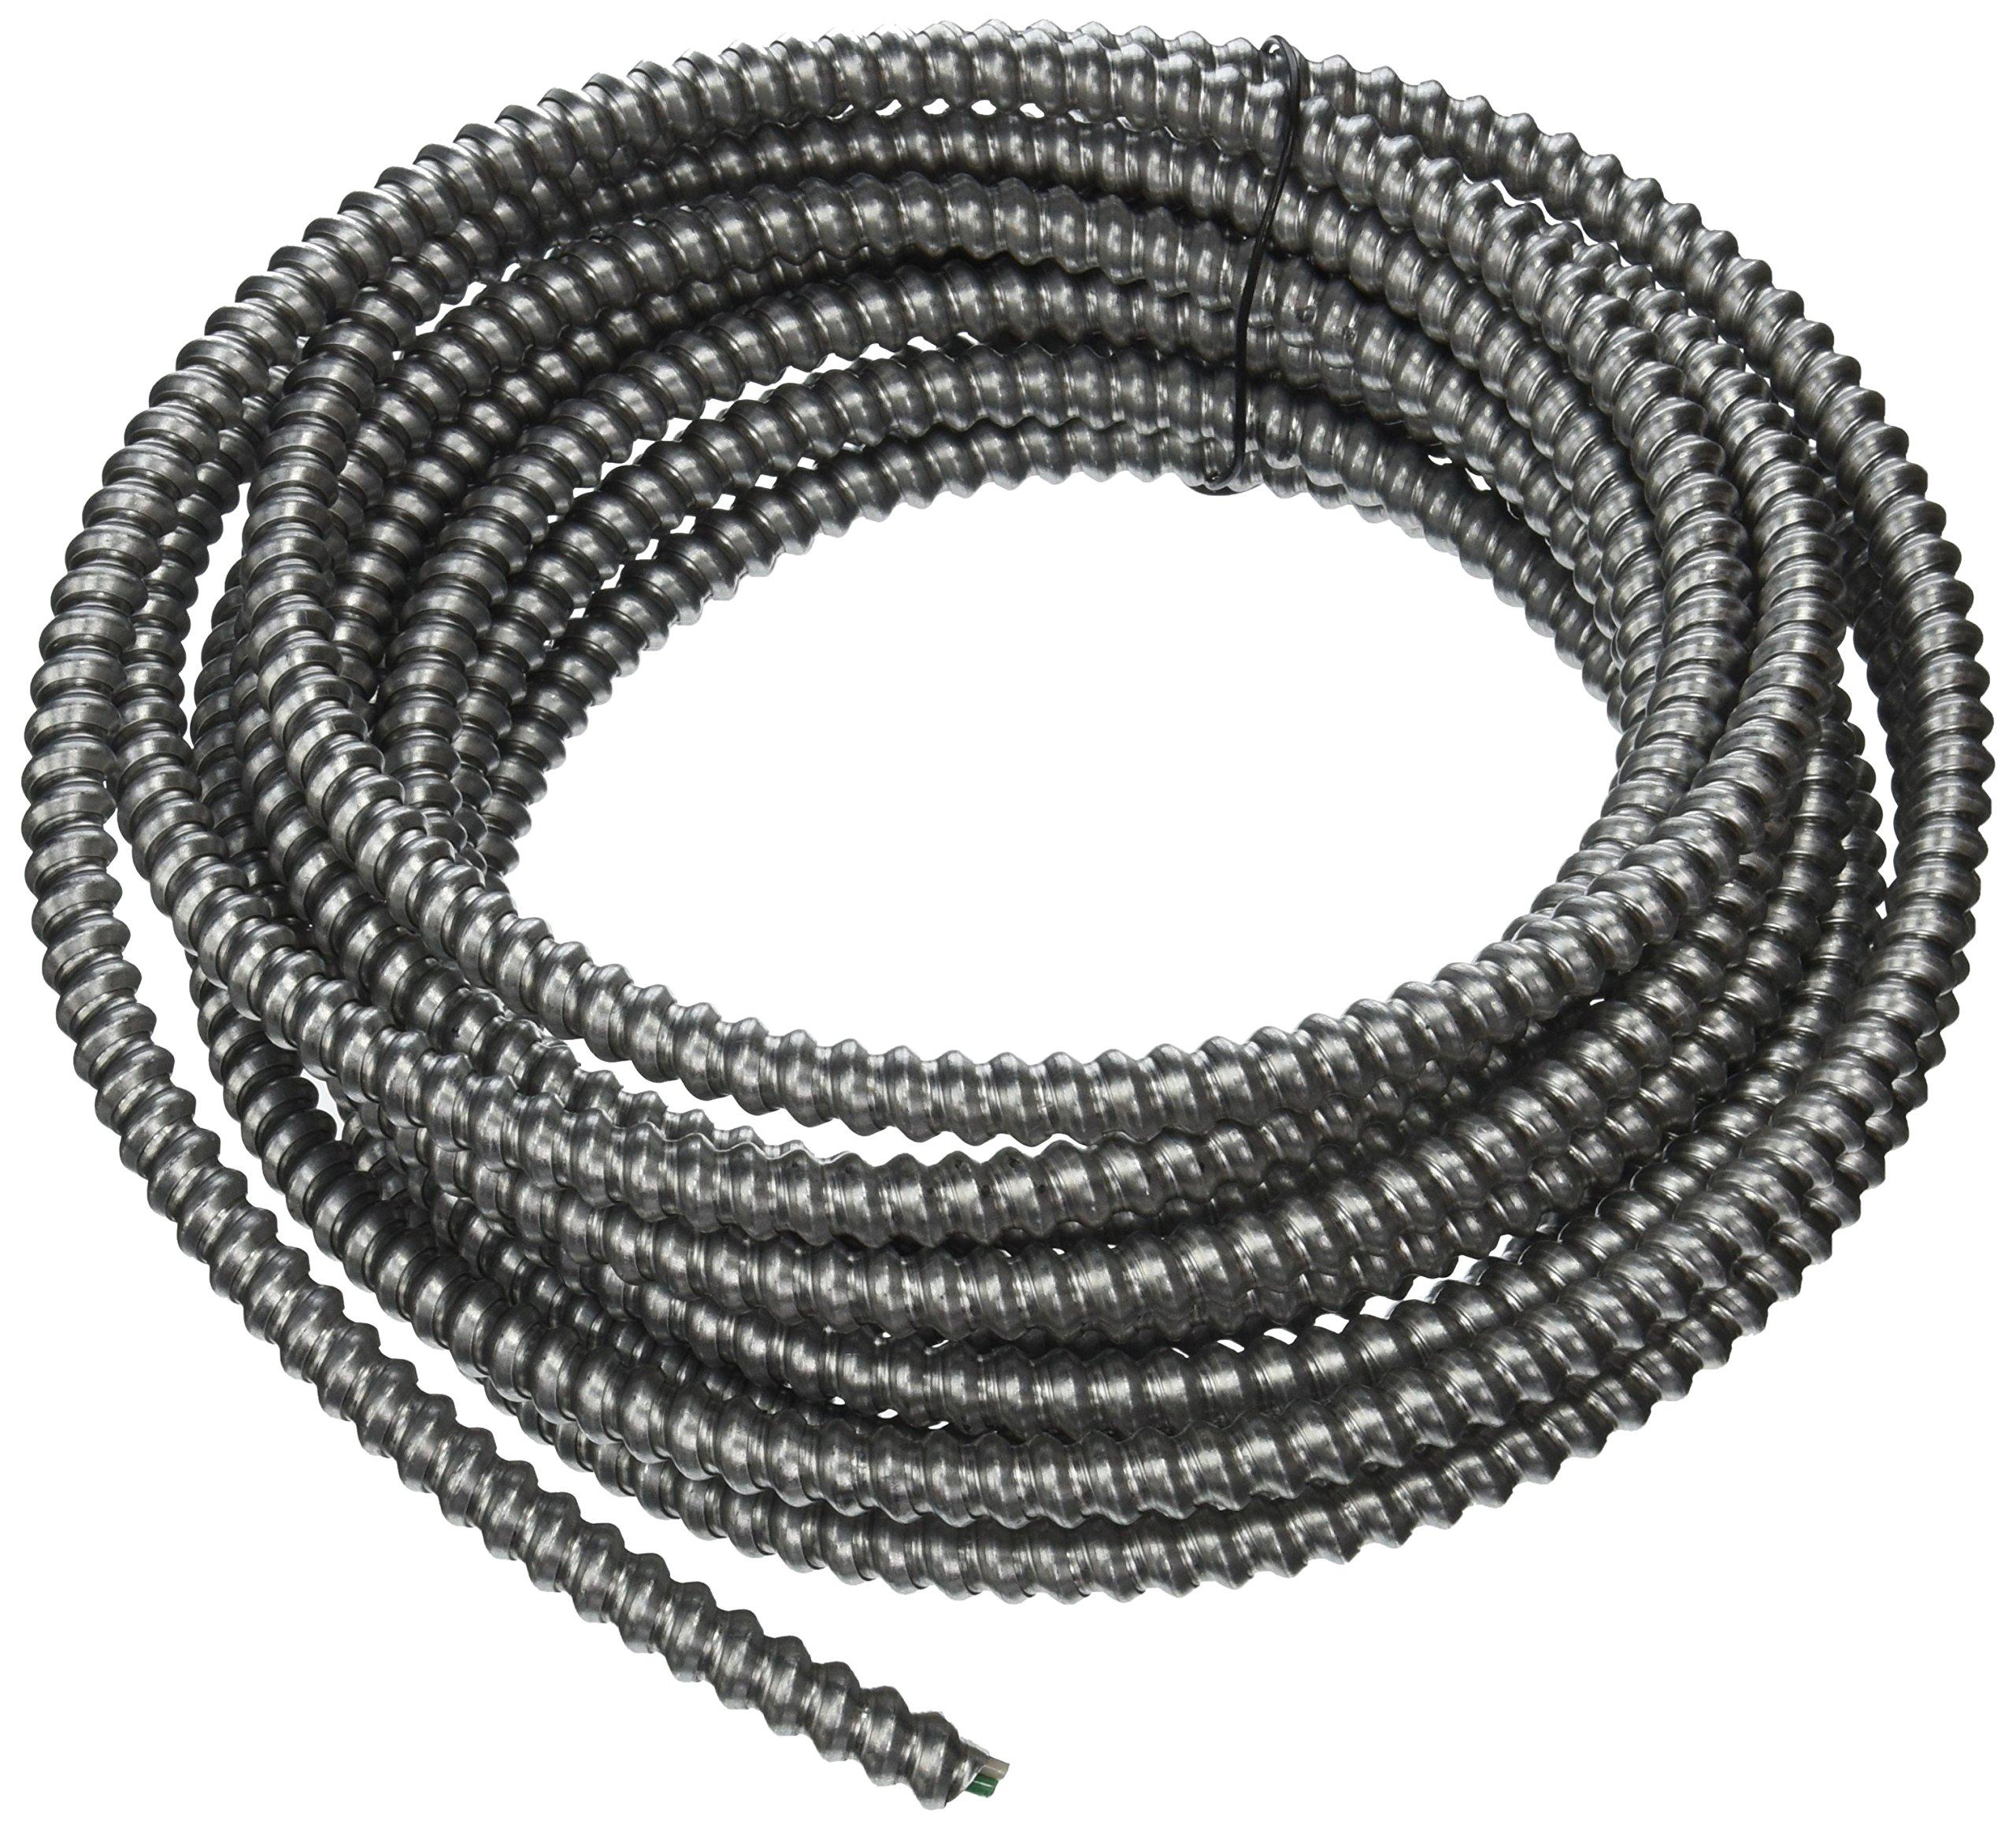 Southwire 68579221 Aluminum Cable